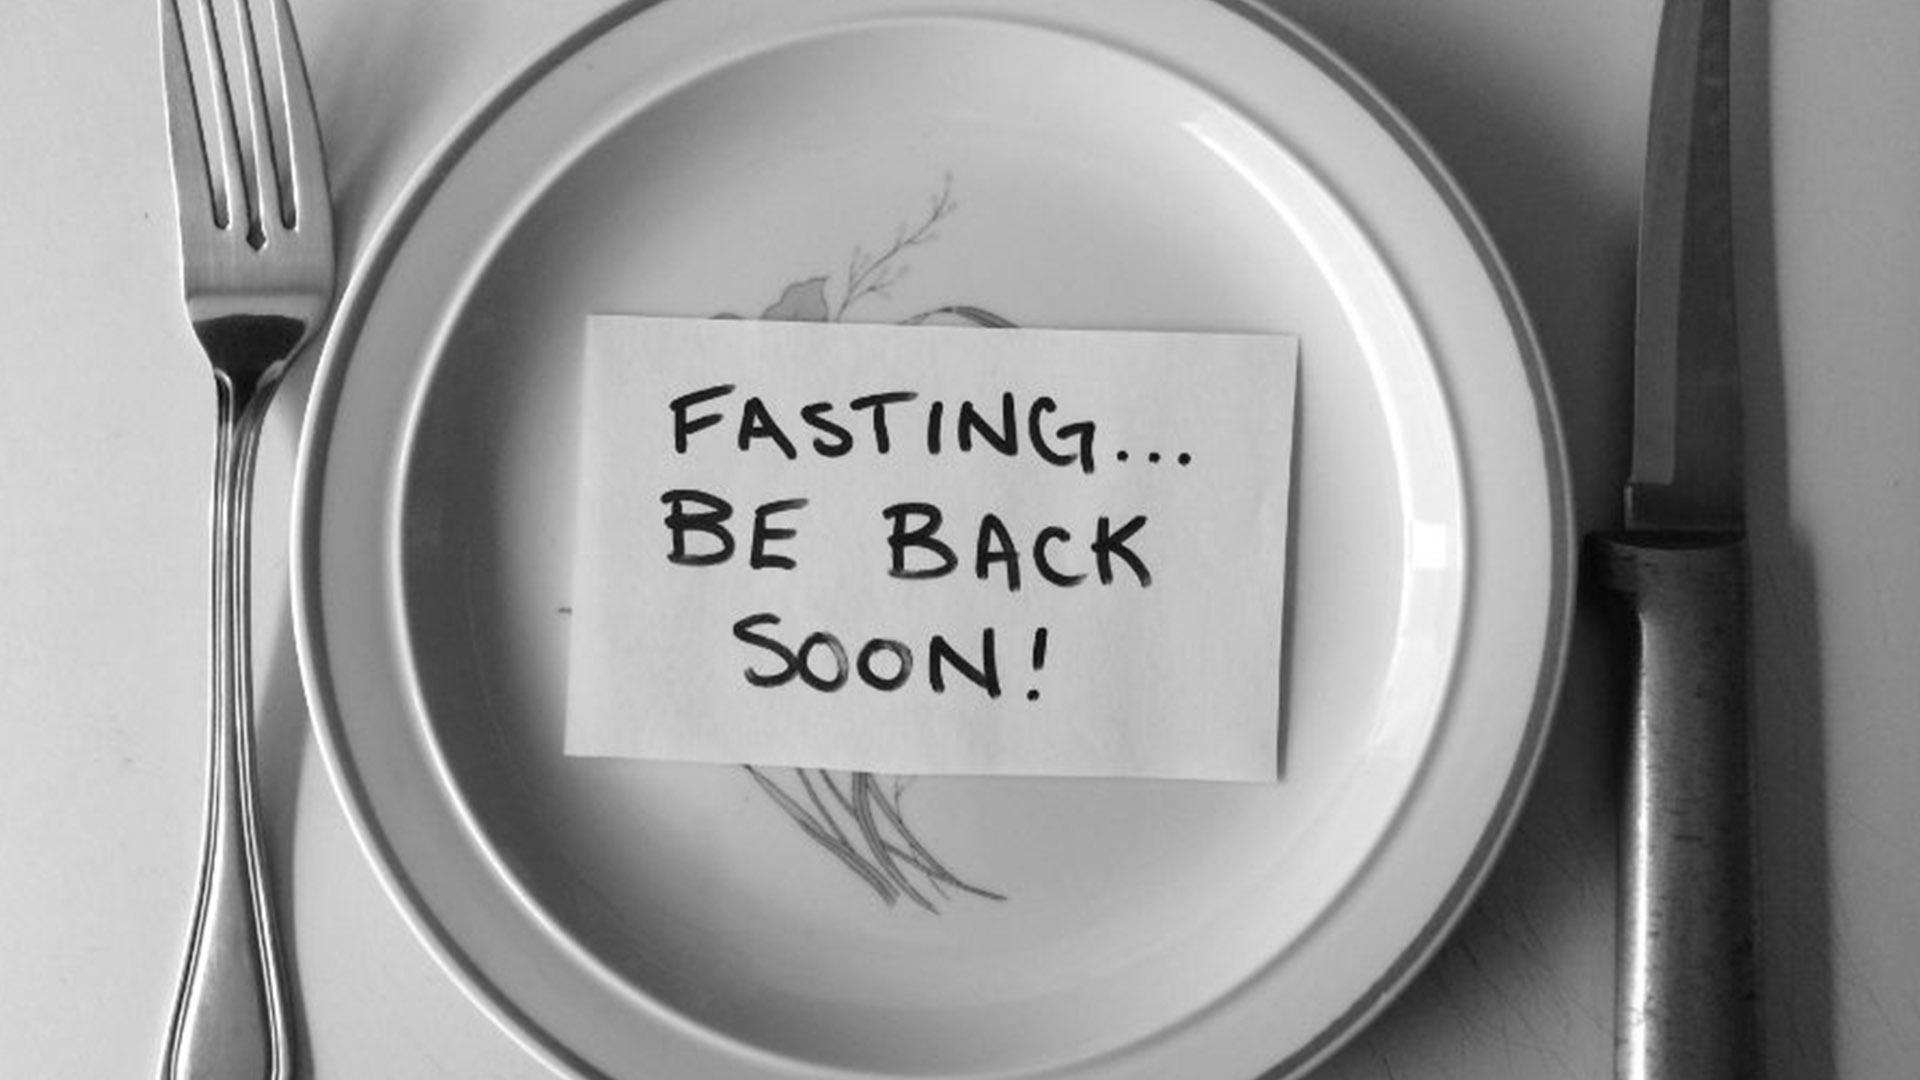 fastingfeasting